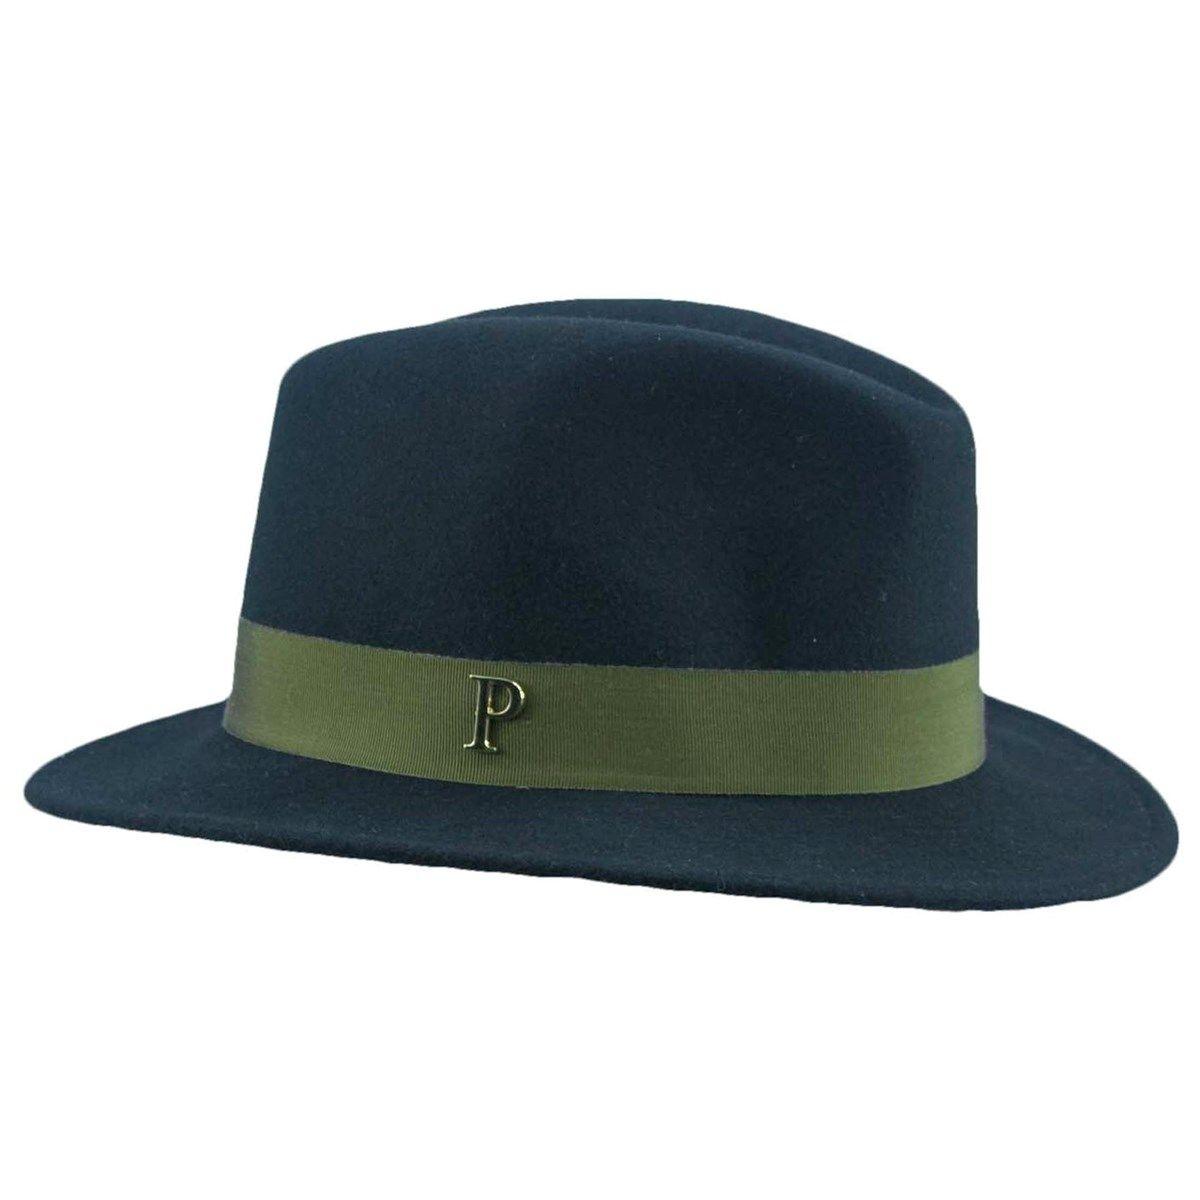 Chapeau feutre Léon ruban interchangeable